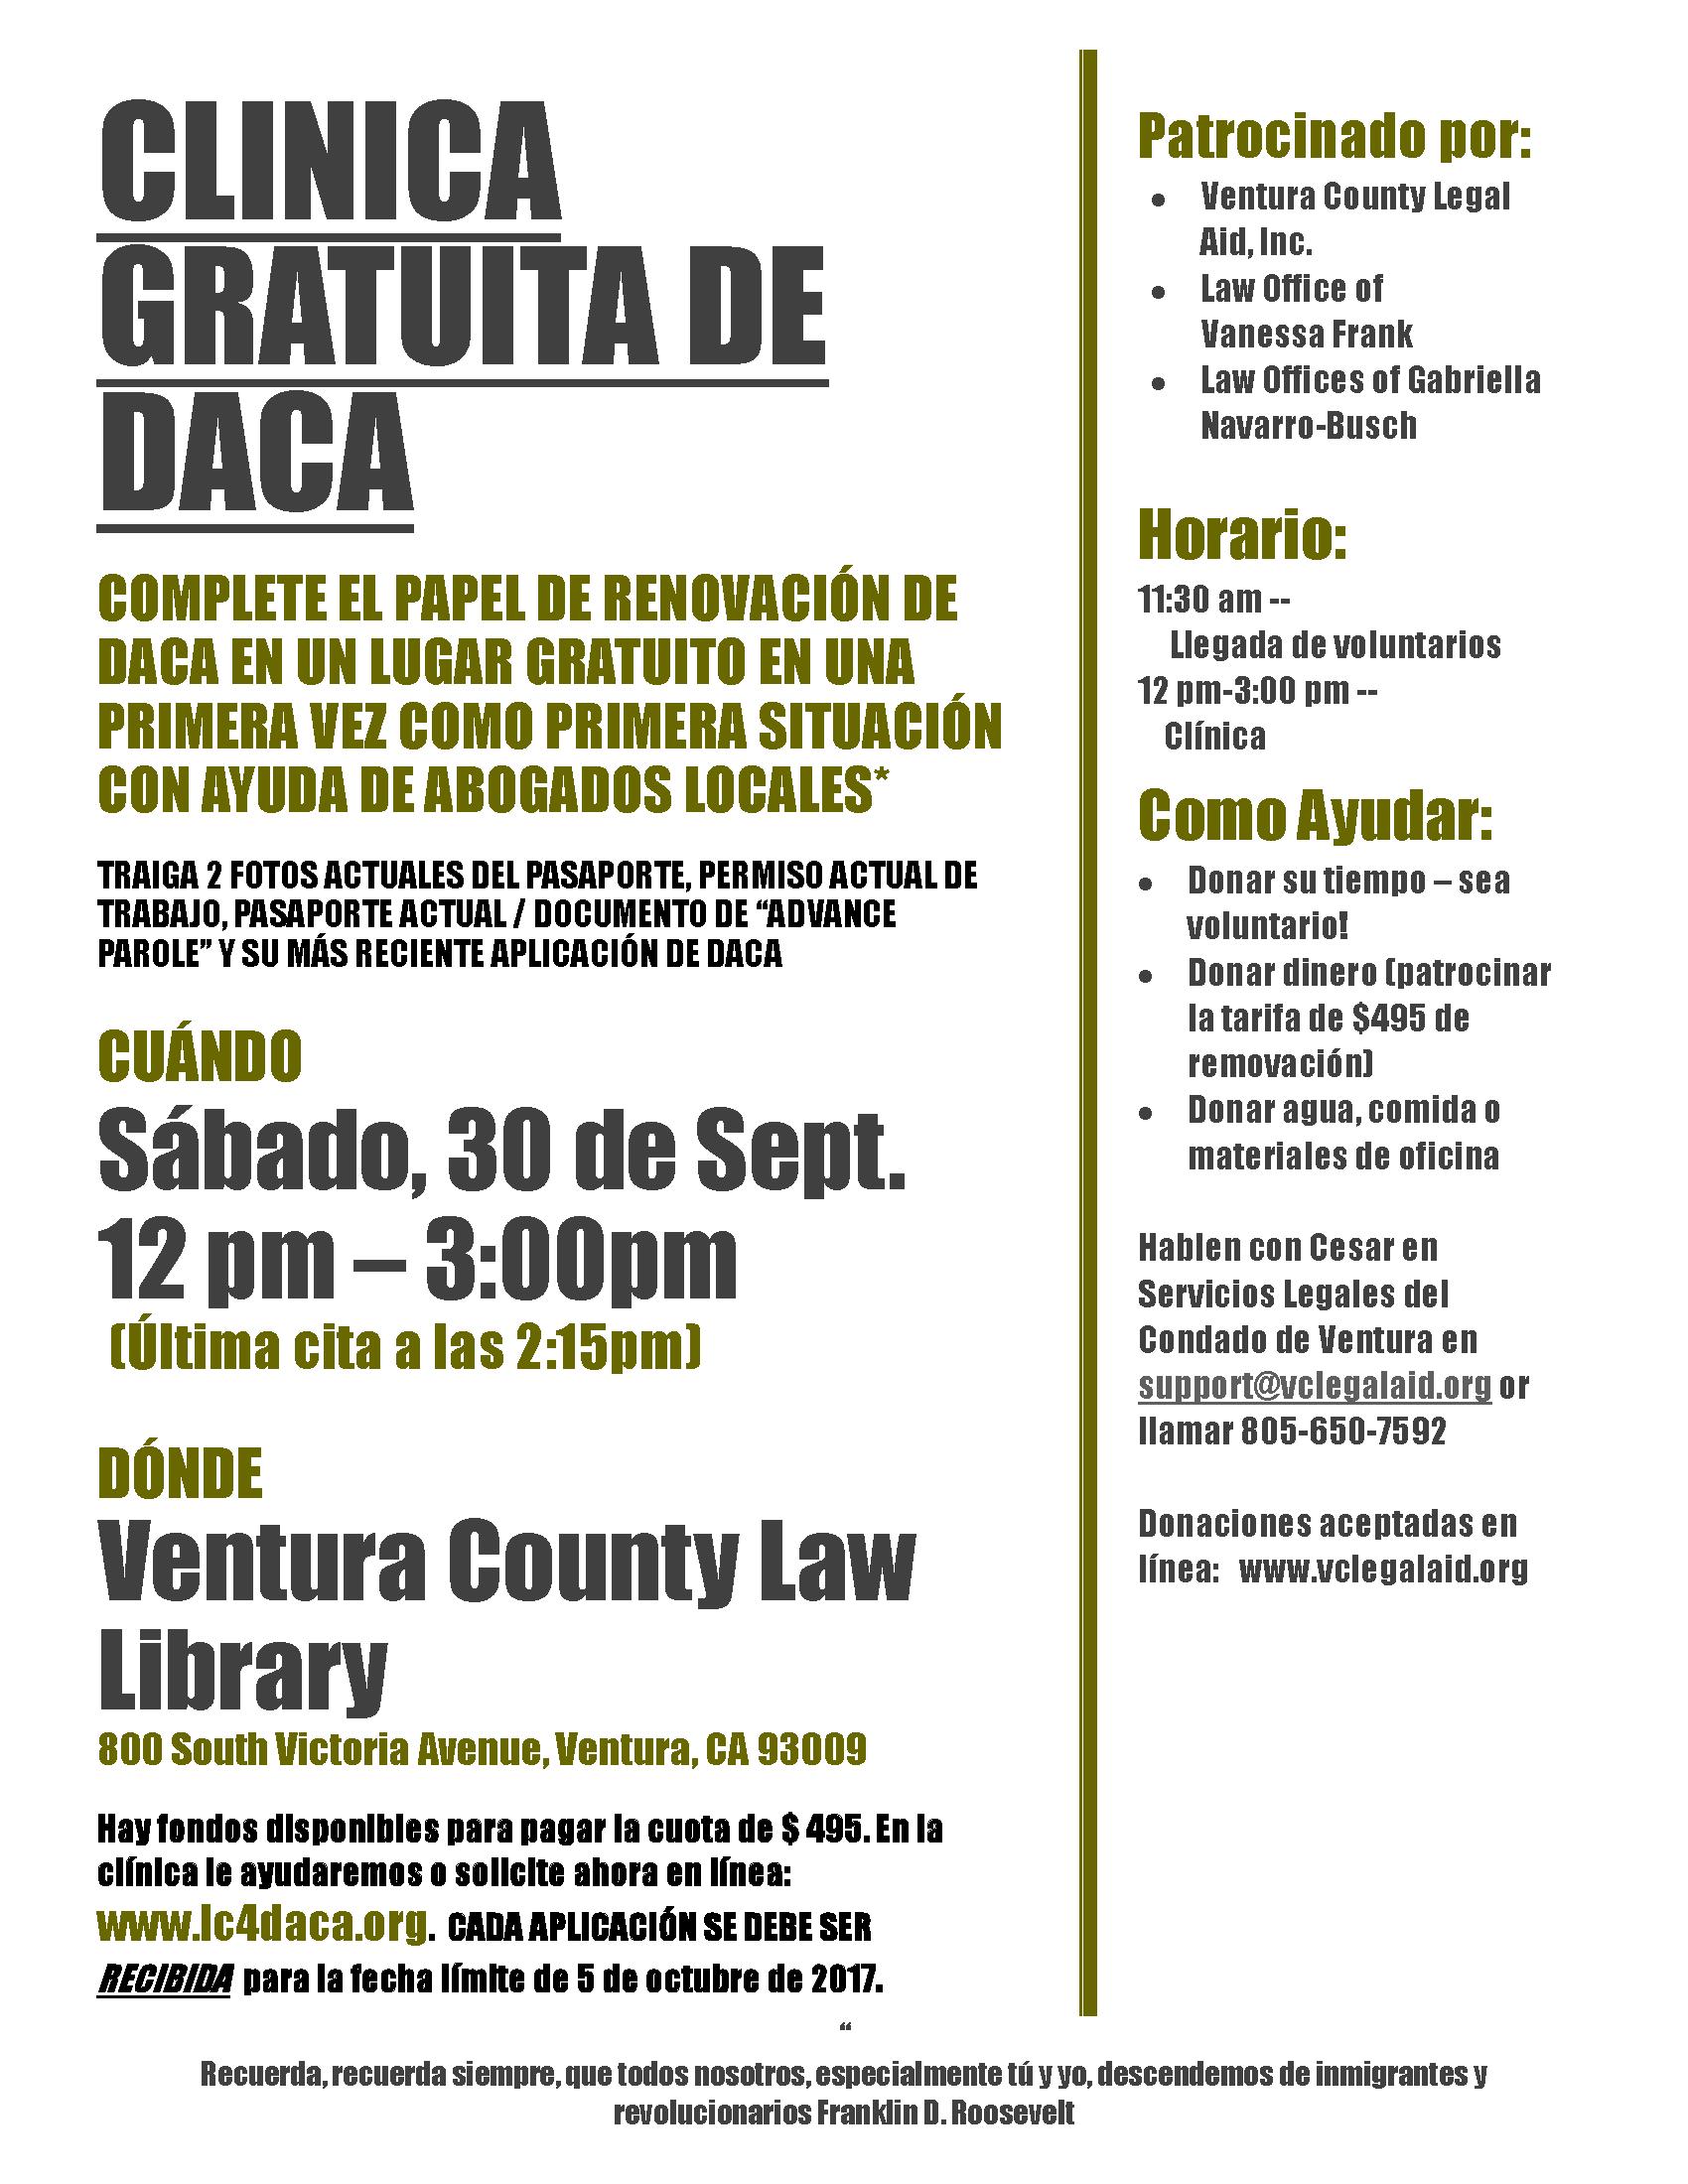 DACA Clinic Sept. 30